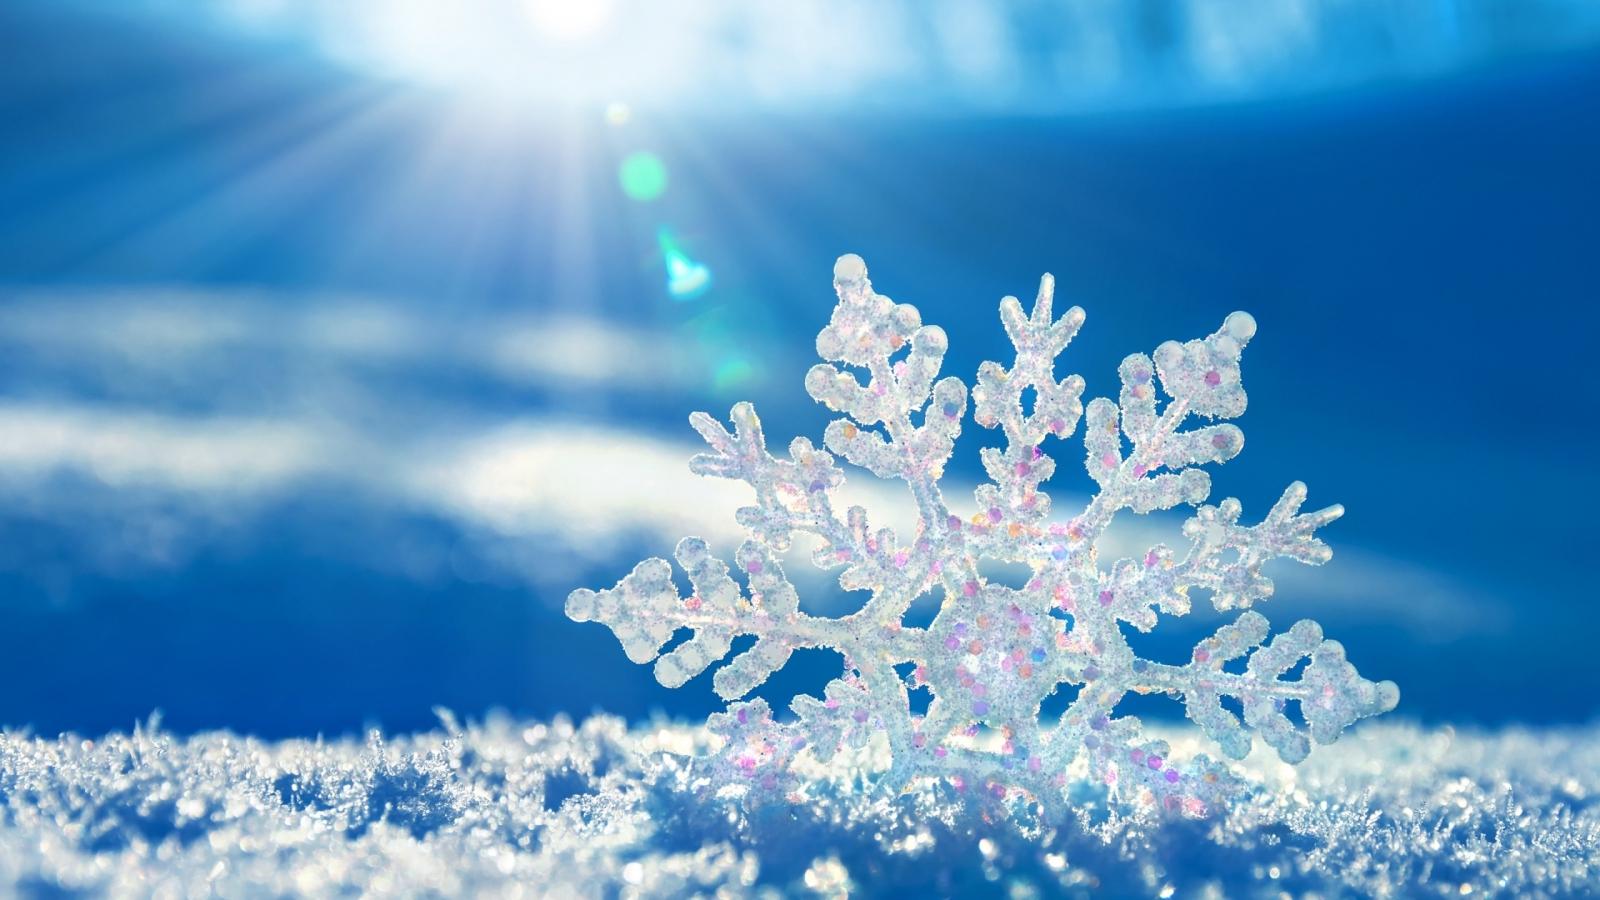 Cristal de hielo - 1600x900